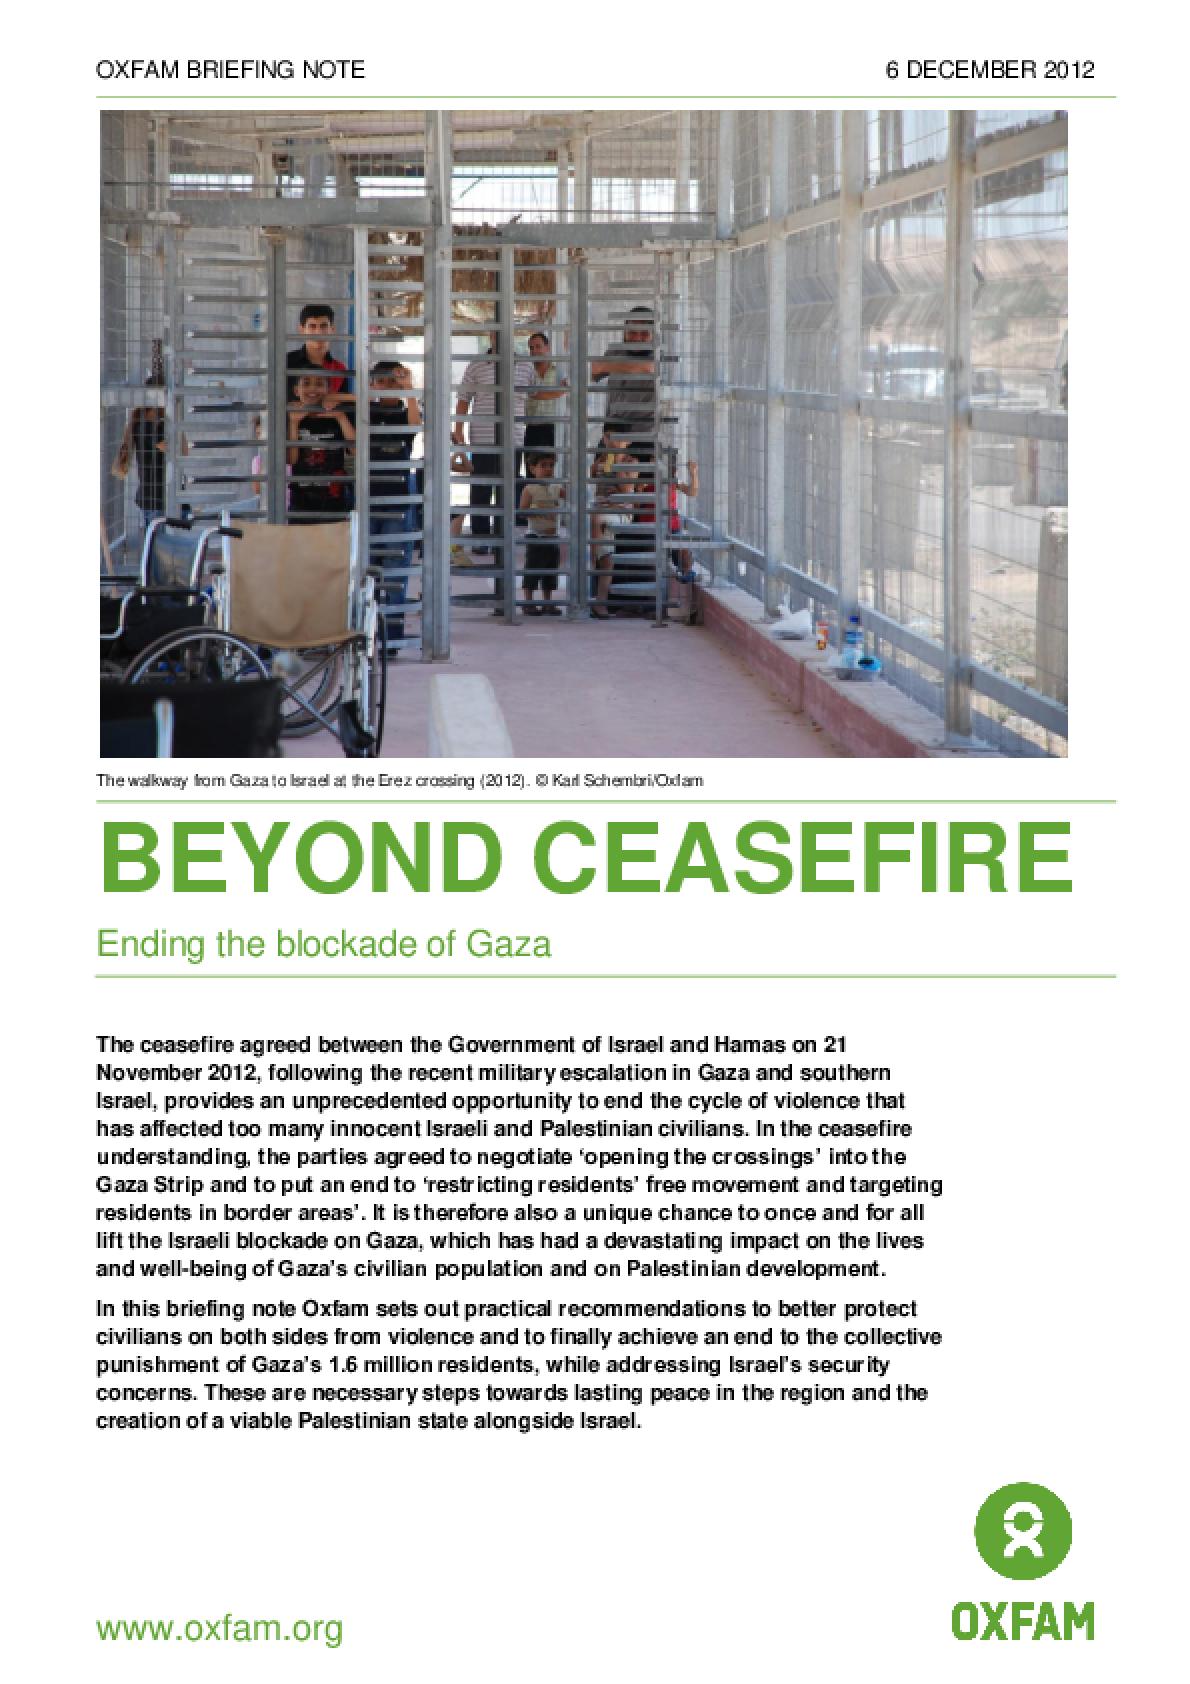 Beyond Ceasefire: Ending the blockade of Gaza